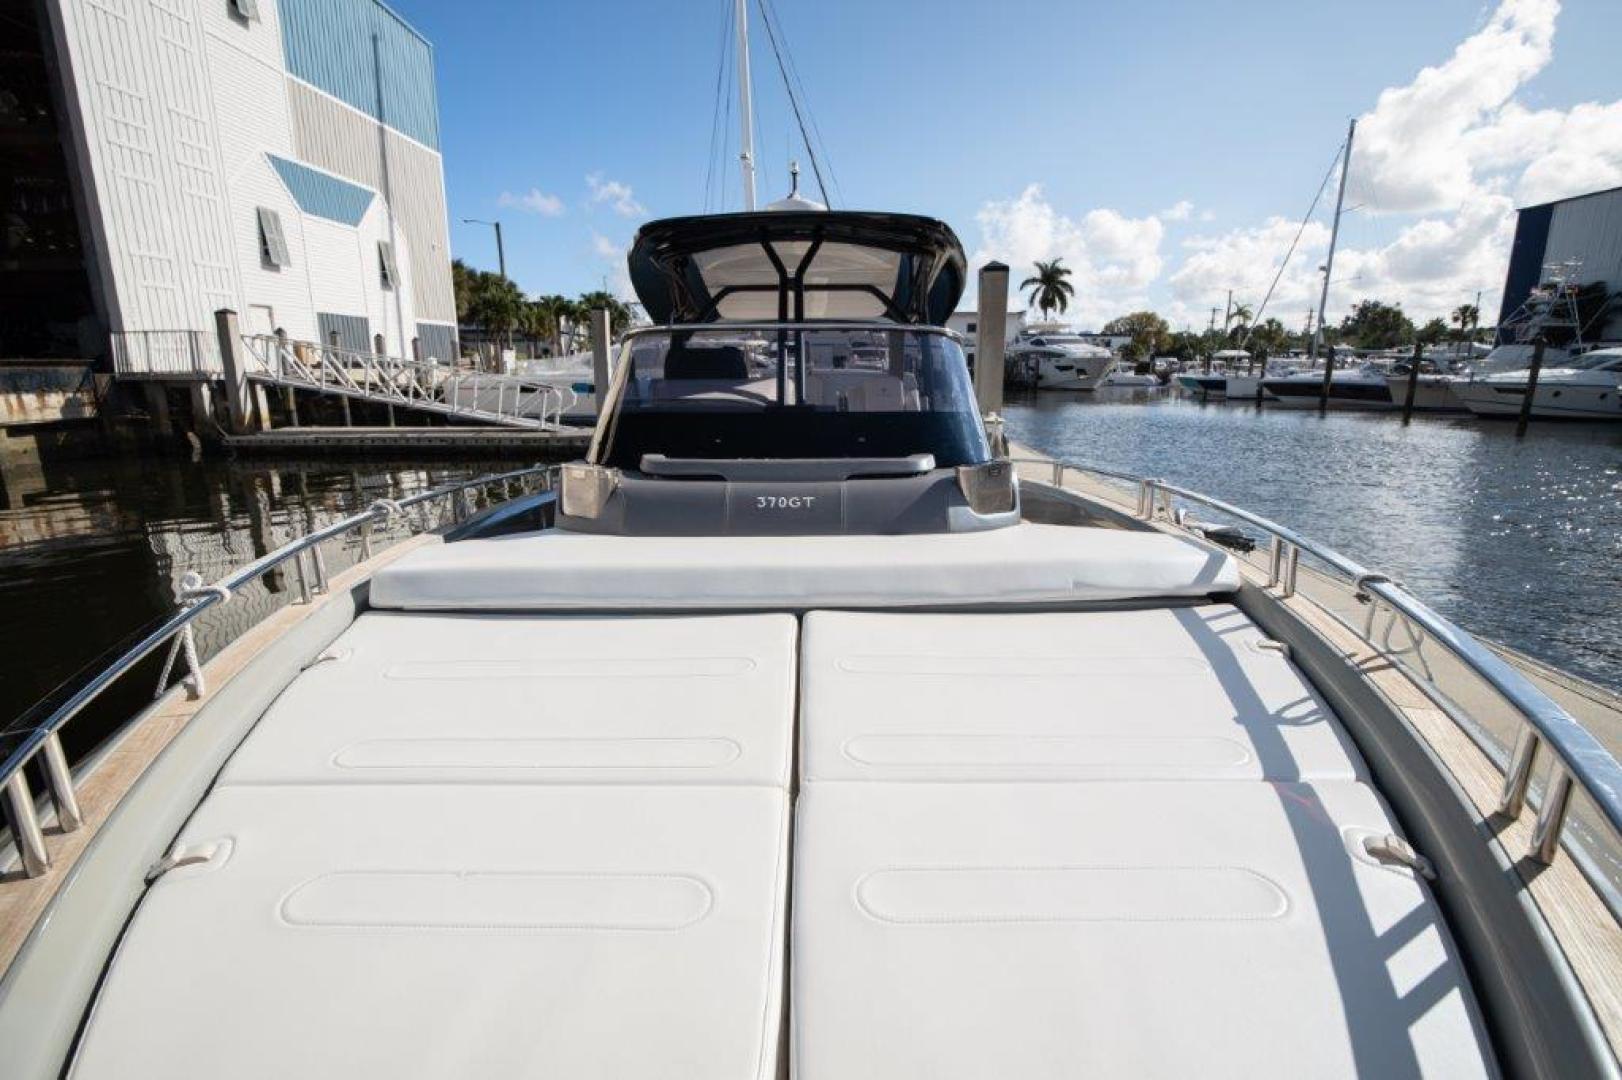 Invictus-370 GT 2018-EOS II Fort Lauderdale-Florida-United States-Sunpad-1624941 | Thumbnail